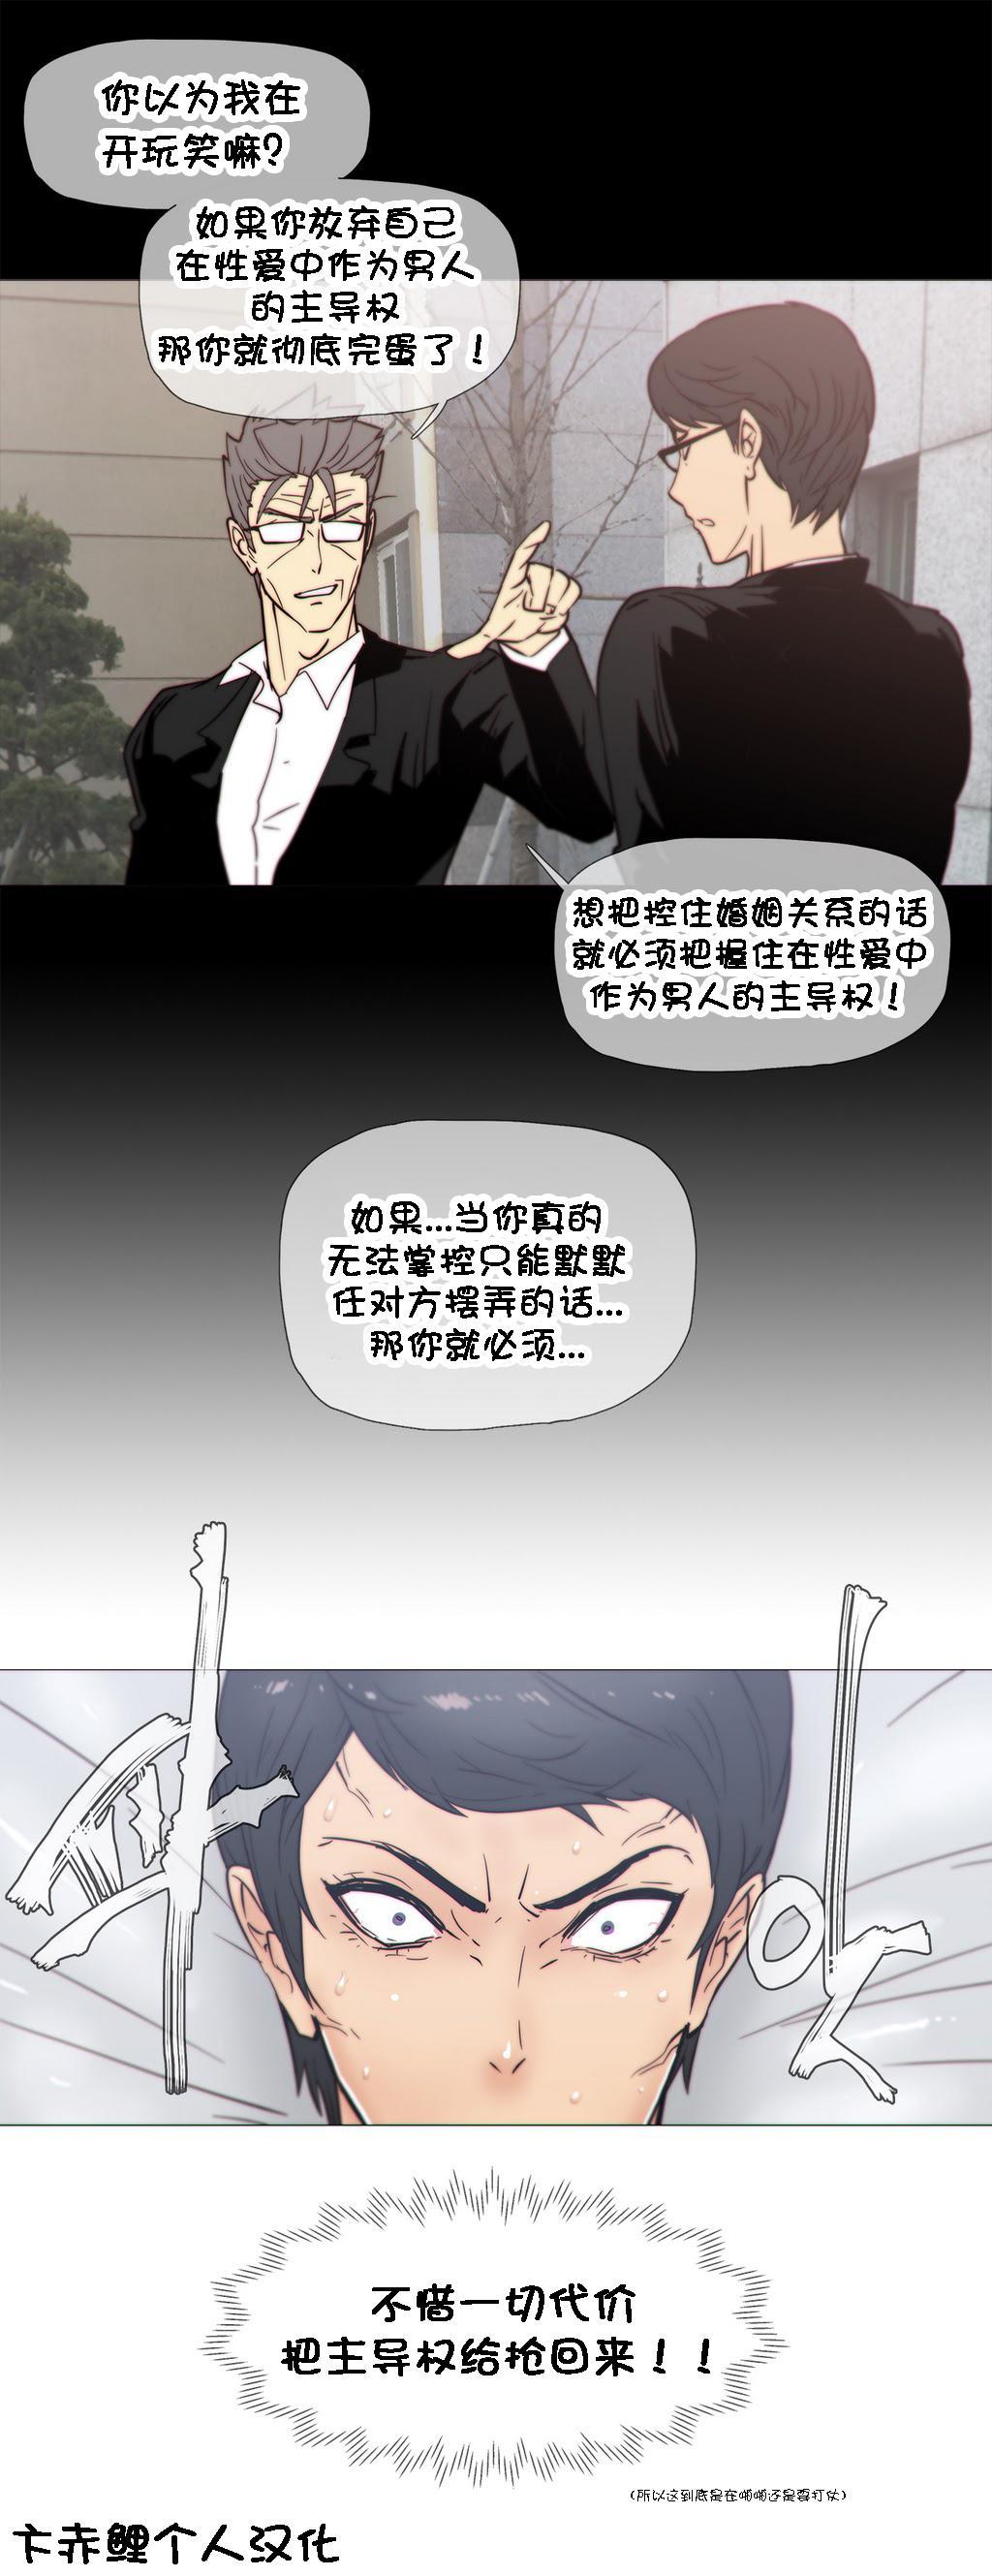 HouseHold Affairs 【卞赤鲤个人汉化】1~33话(持续更新中) 527